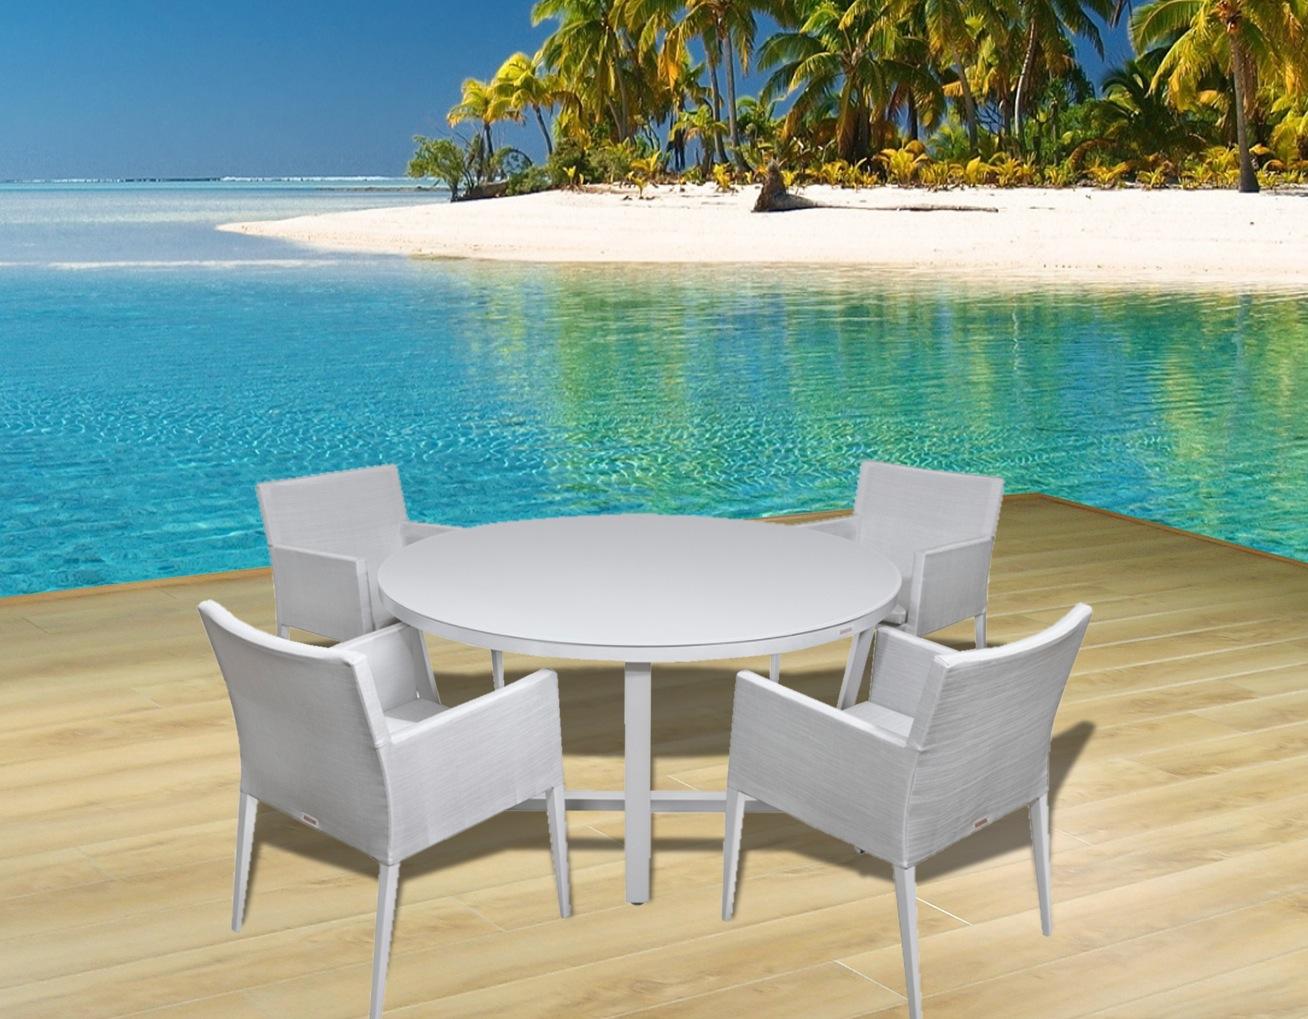 Bitta modern patio furniture by rodolfo dordoni - Design760480 Modern Patio Furniture Modern Outdoor Furniture